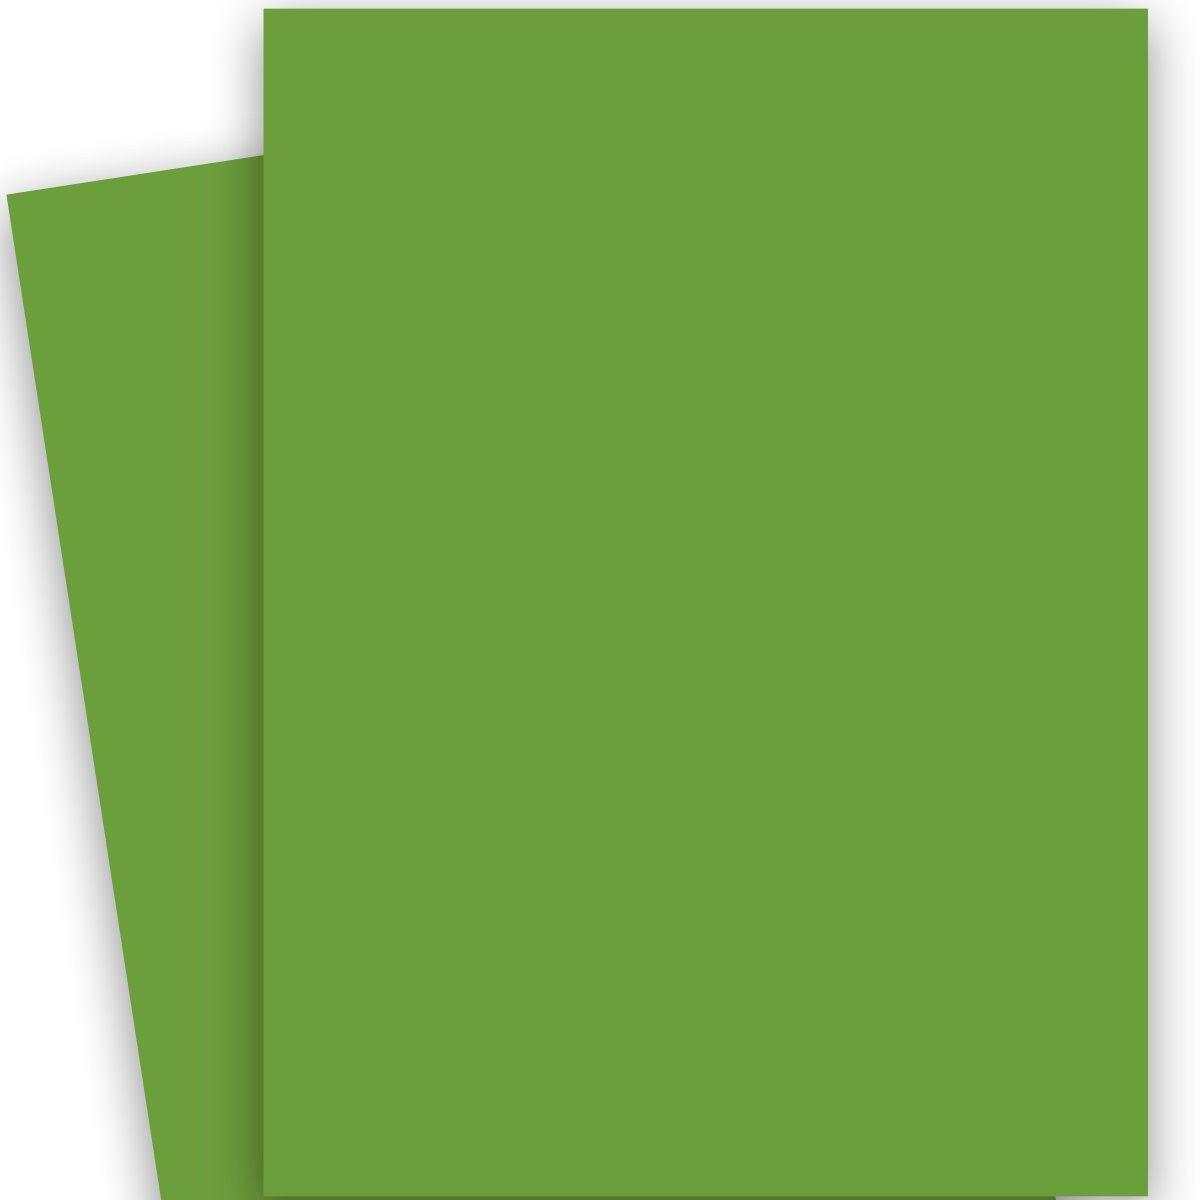 Poptone Gumdrop Green 26x40 65c 175gsm Lightweight Card Stock Paper In 2021 French Paper Paper Pop Green Paper